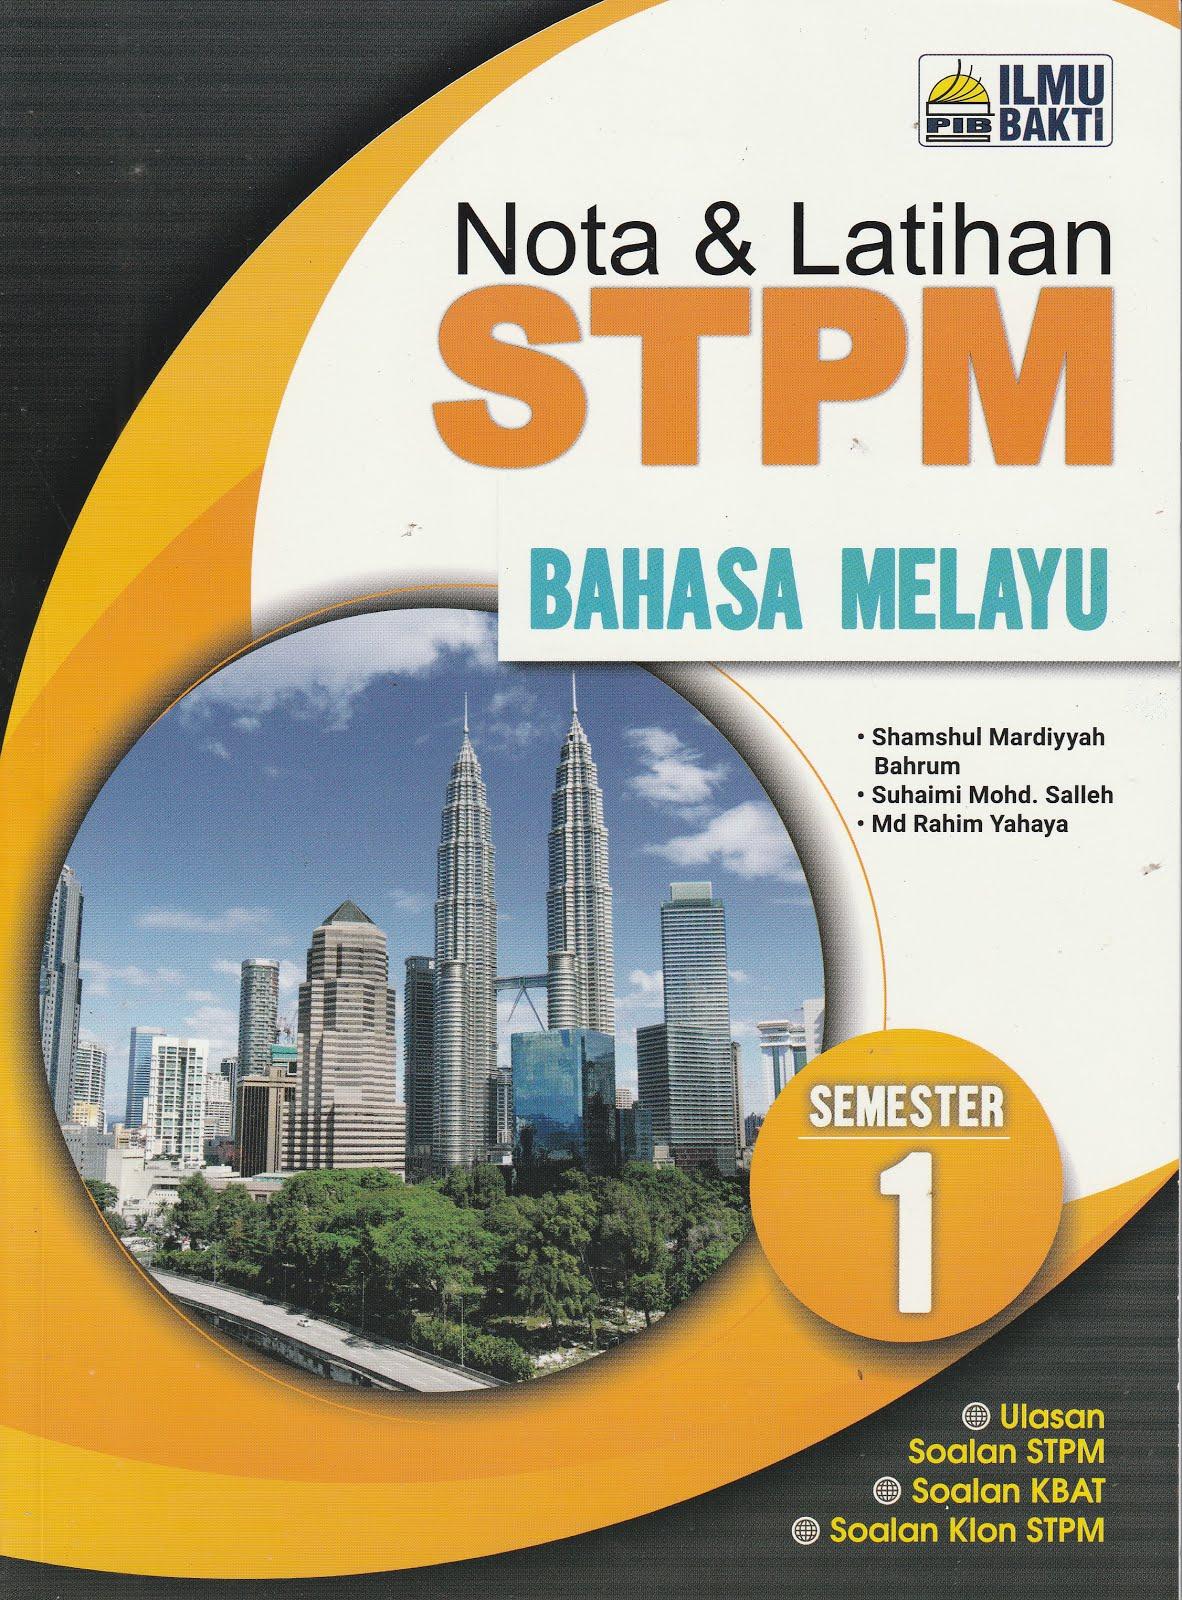 NOTA & LATIHAN STPM SEMESTER 1